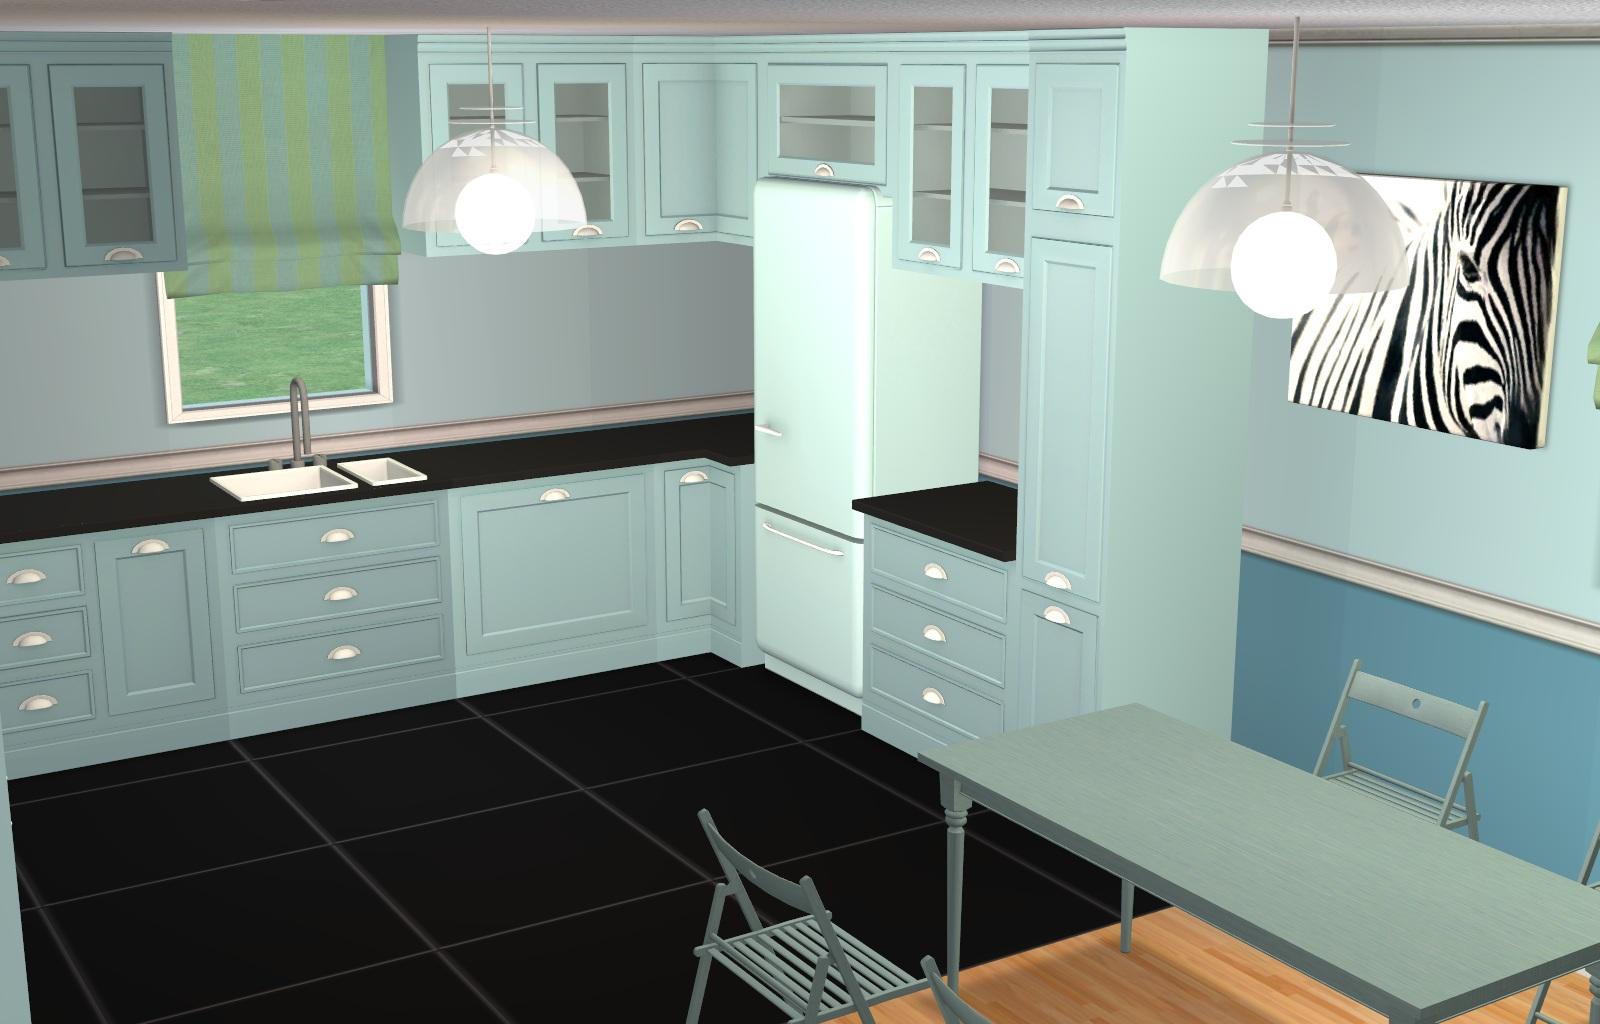 Mod The Sims - Ye Olde Curiosity Shoppe (Home Business)